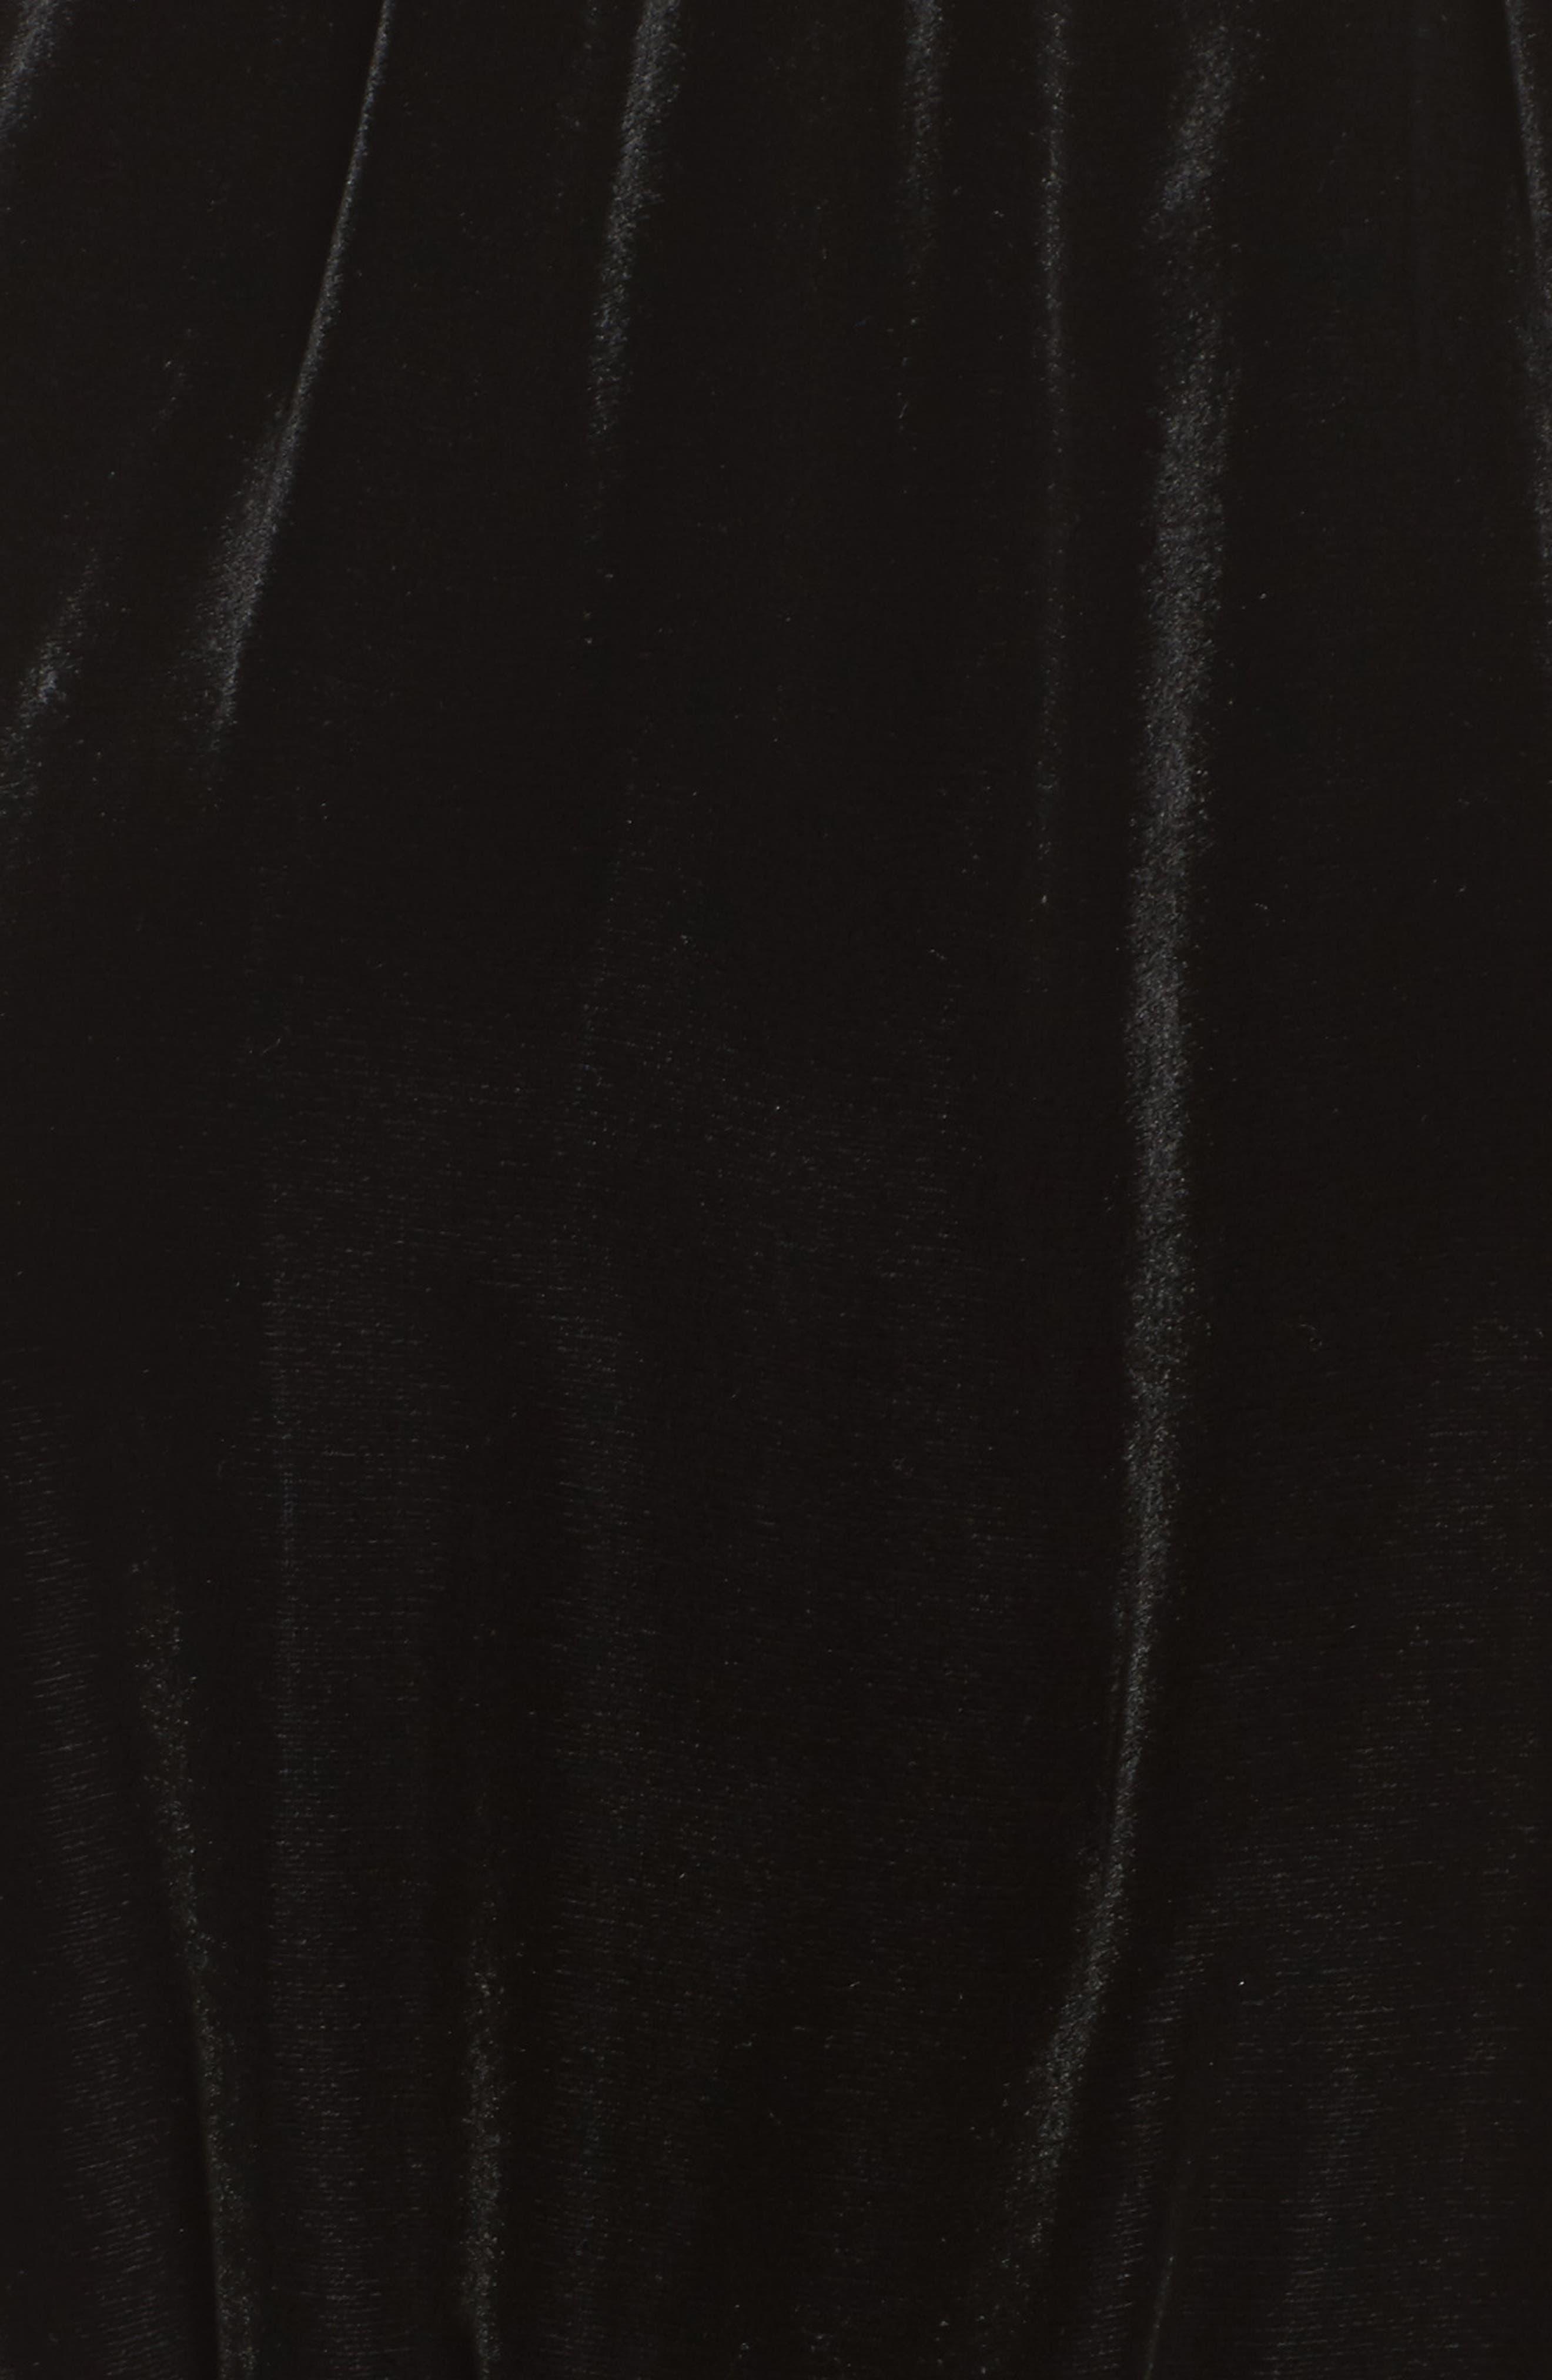 Difosia Velvet Midi Dress,                             Alternate thumbnail 5, color,                             Black